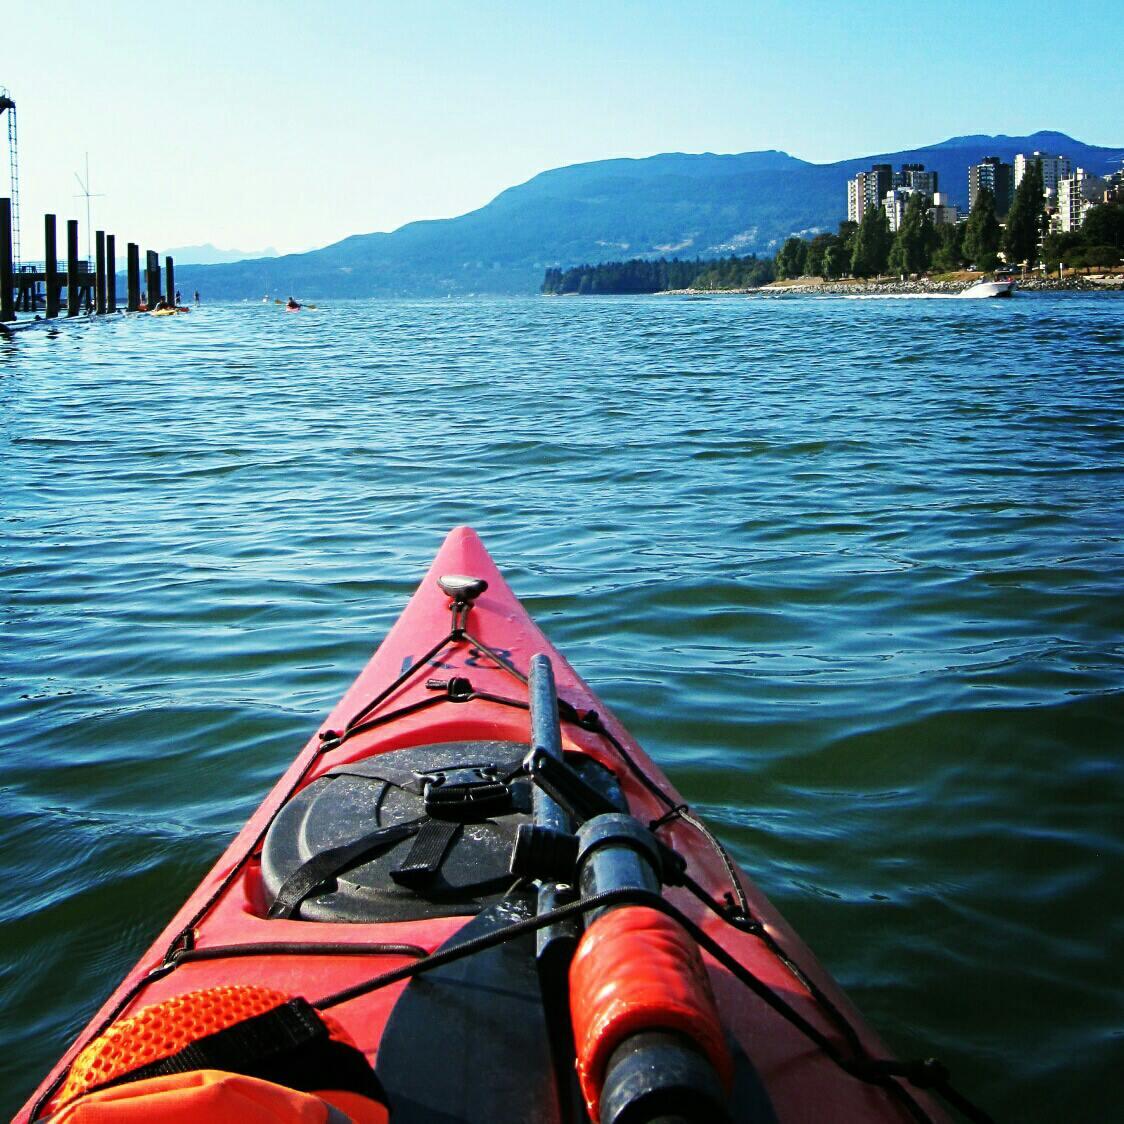 Kayaking towards the Burrard Bridge